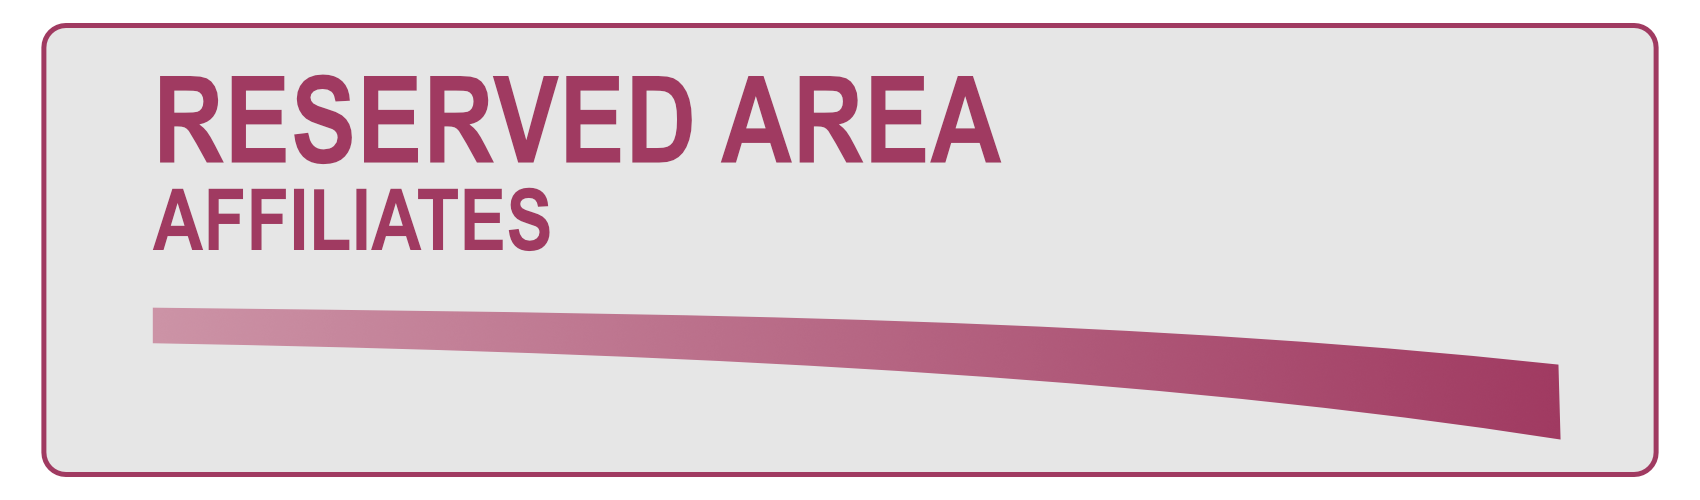 area_riservata_eng